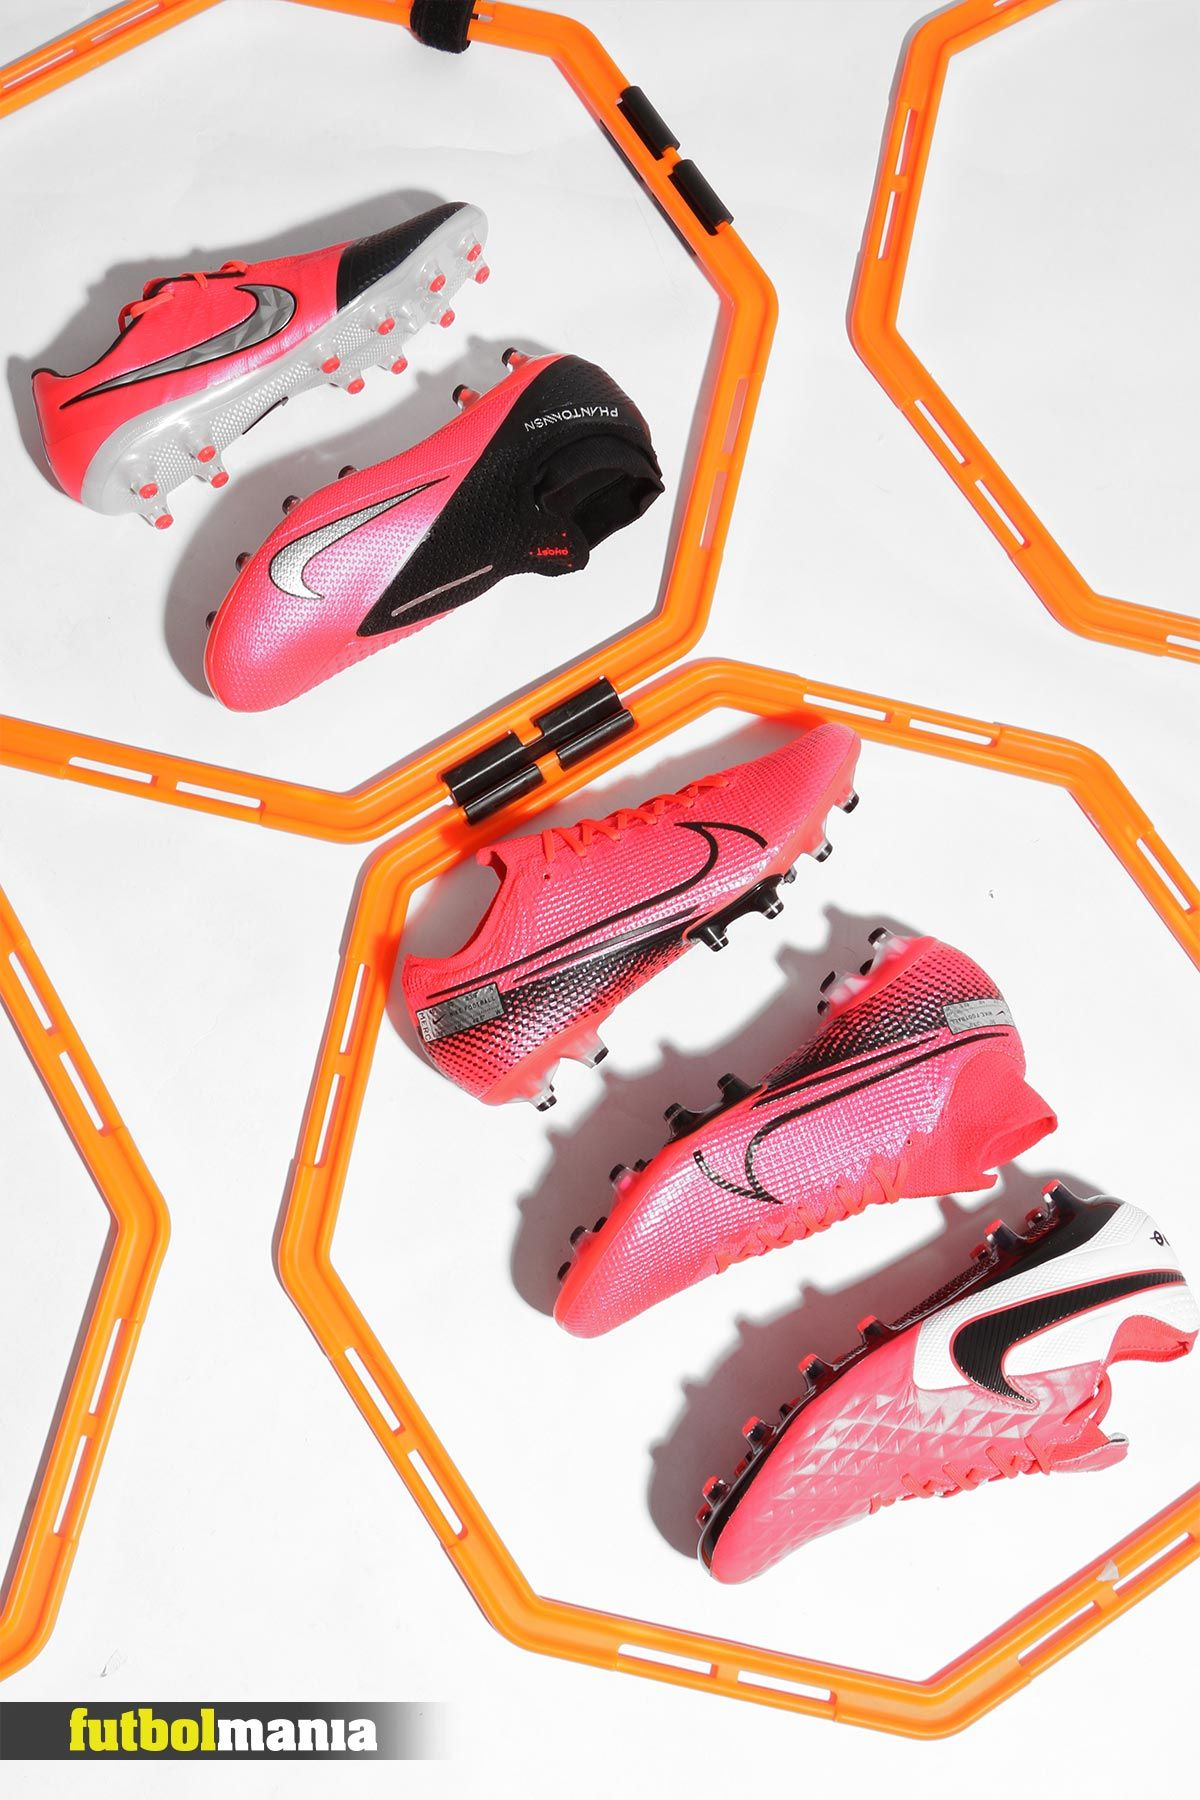 Calma Continuar Tahití  Botas de fútbol Nike | Nike fútbol, Botas de futbol nike, Botas de futbol